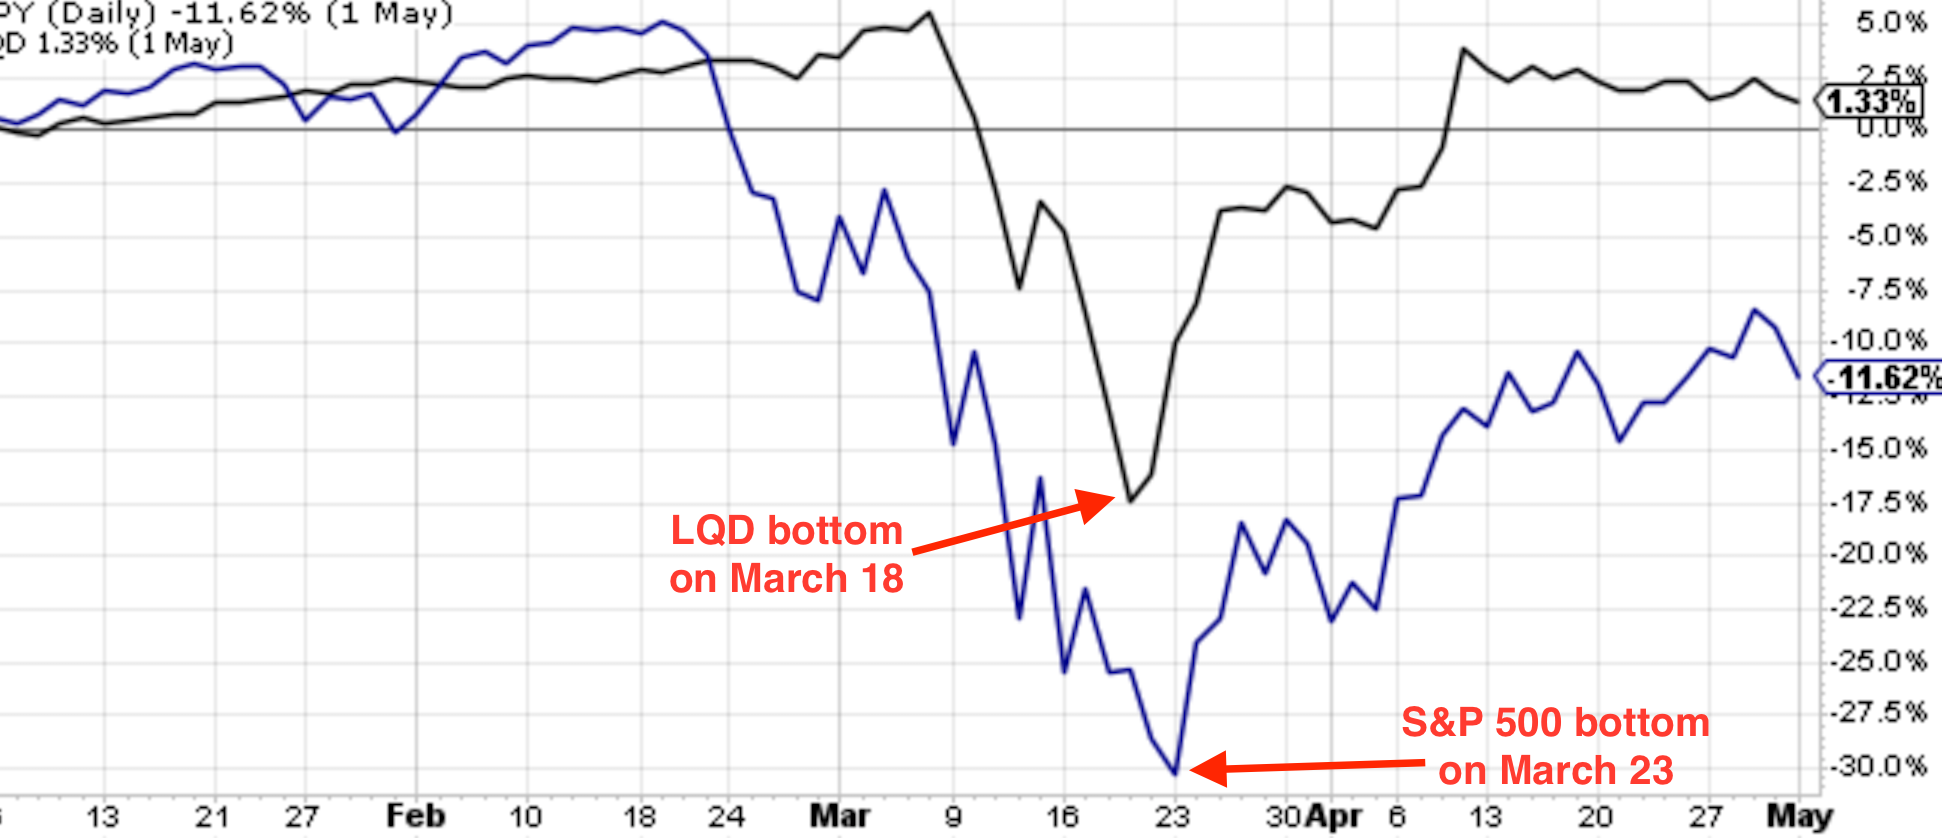 LQD bottom March 2020